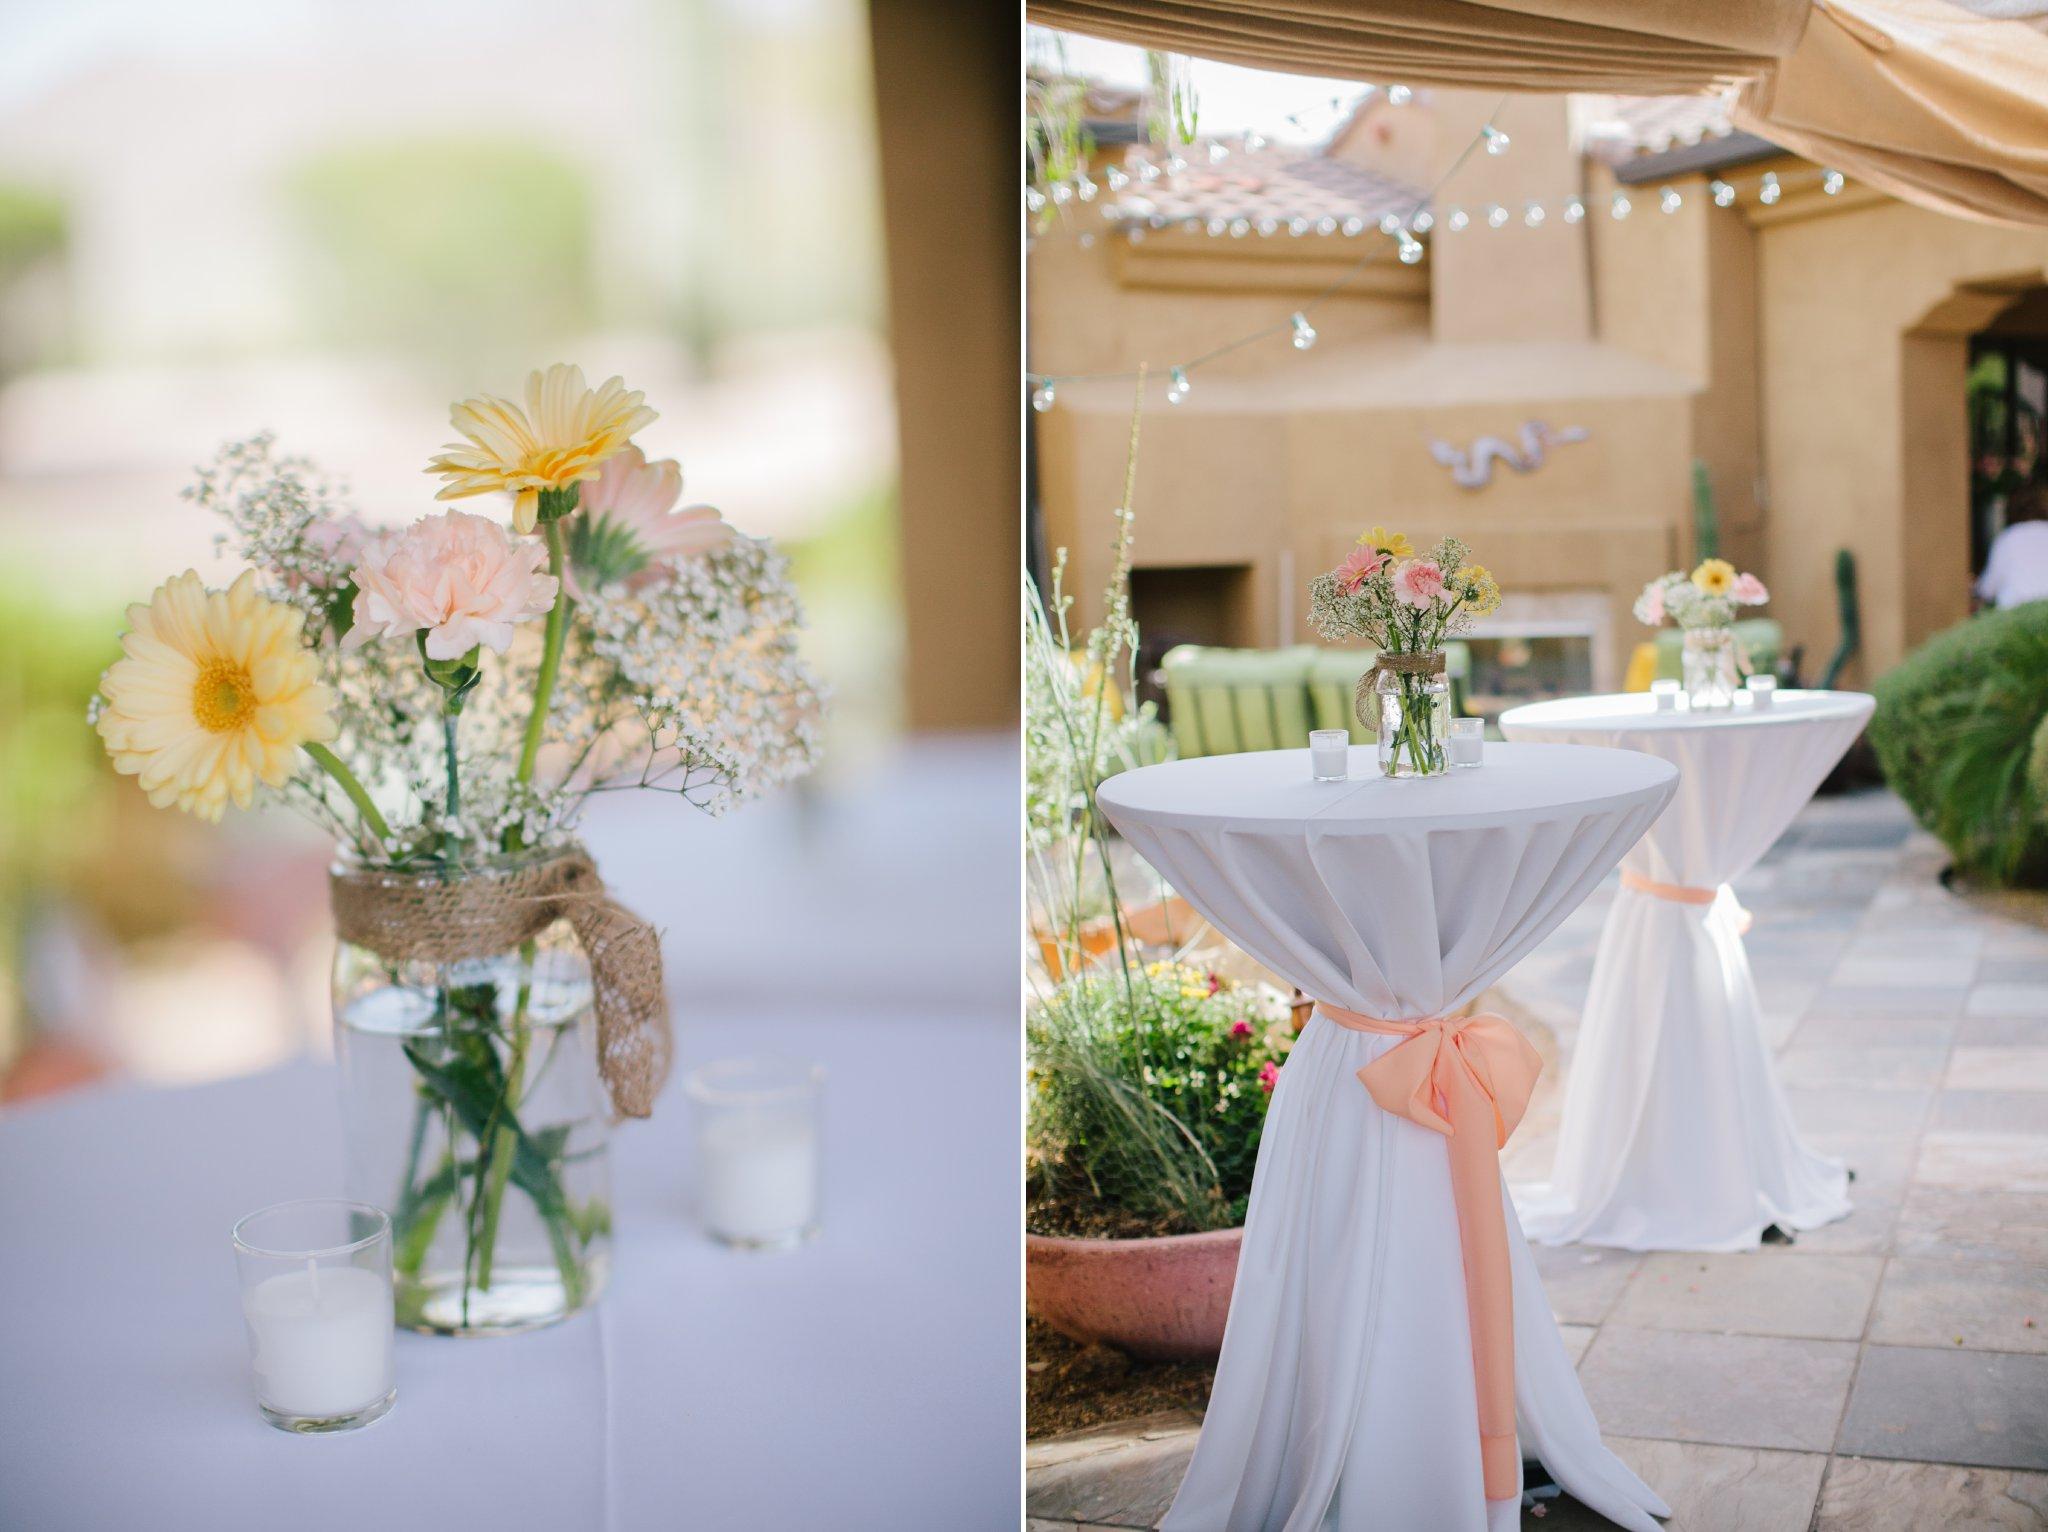 Arizona backyard wedding simple floral centerpieces daisies & baby's breath with burlap ribbon